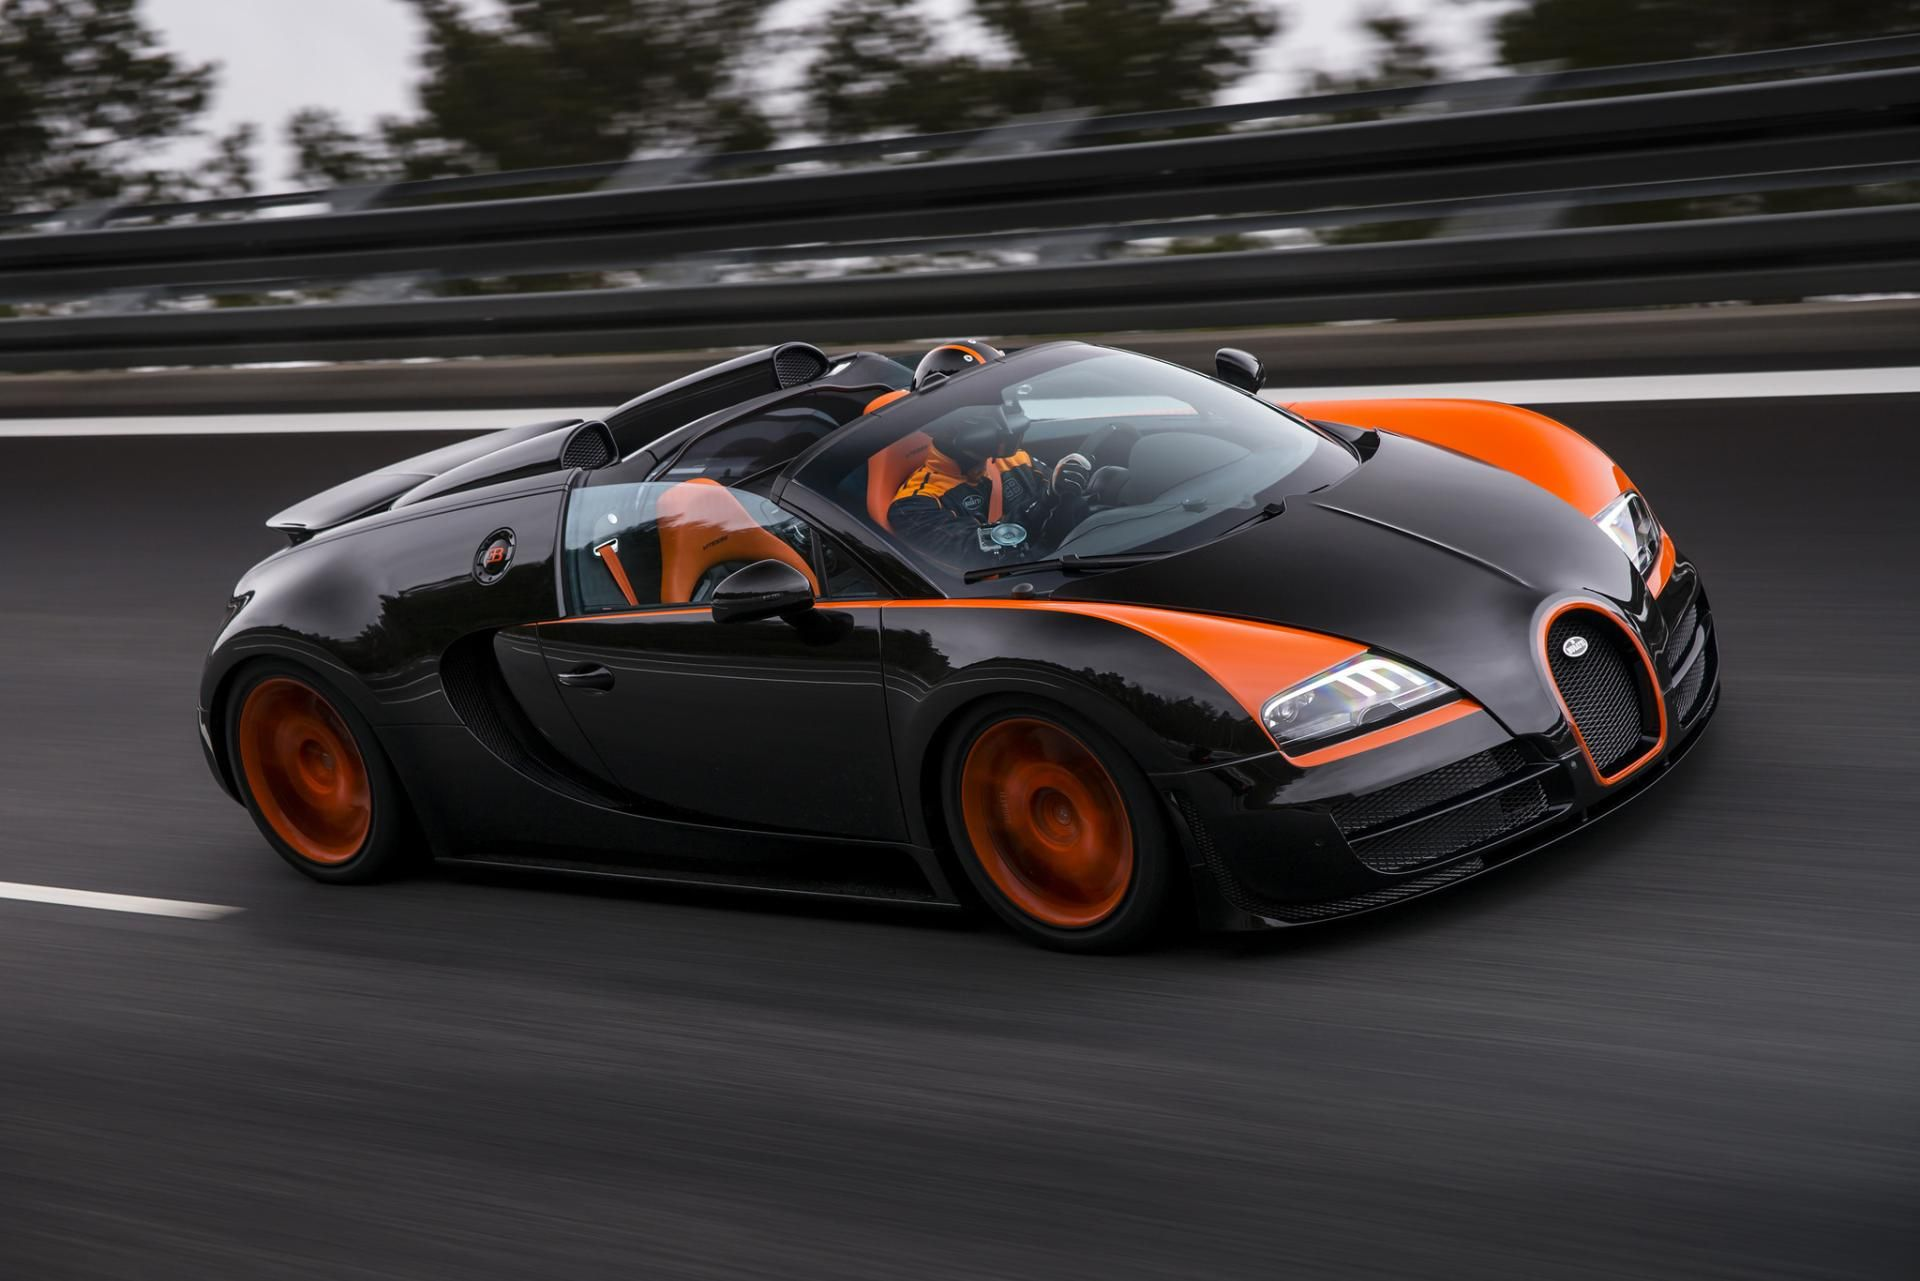 d28c89f62b15c3649d0aa9e650be6640 Extraordinary Bugatti Veyron Grand Sport Vitesse Real Racing 3 Cars Trend